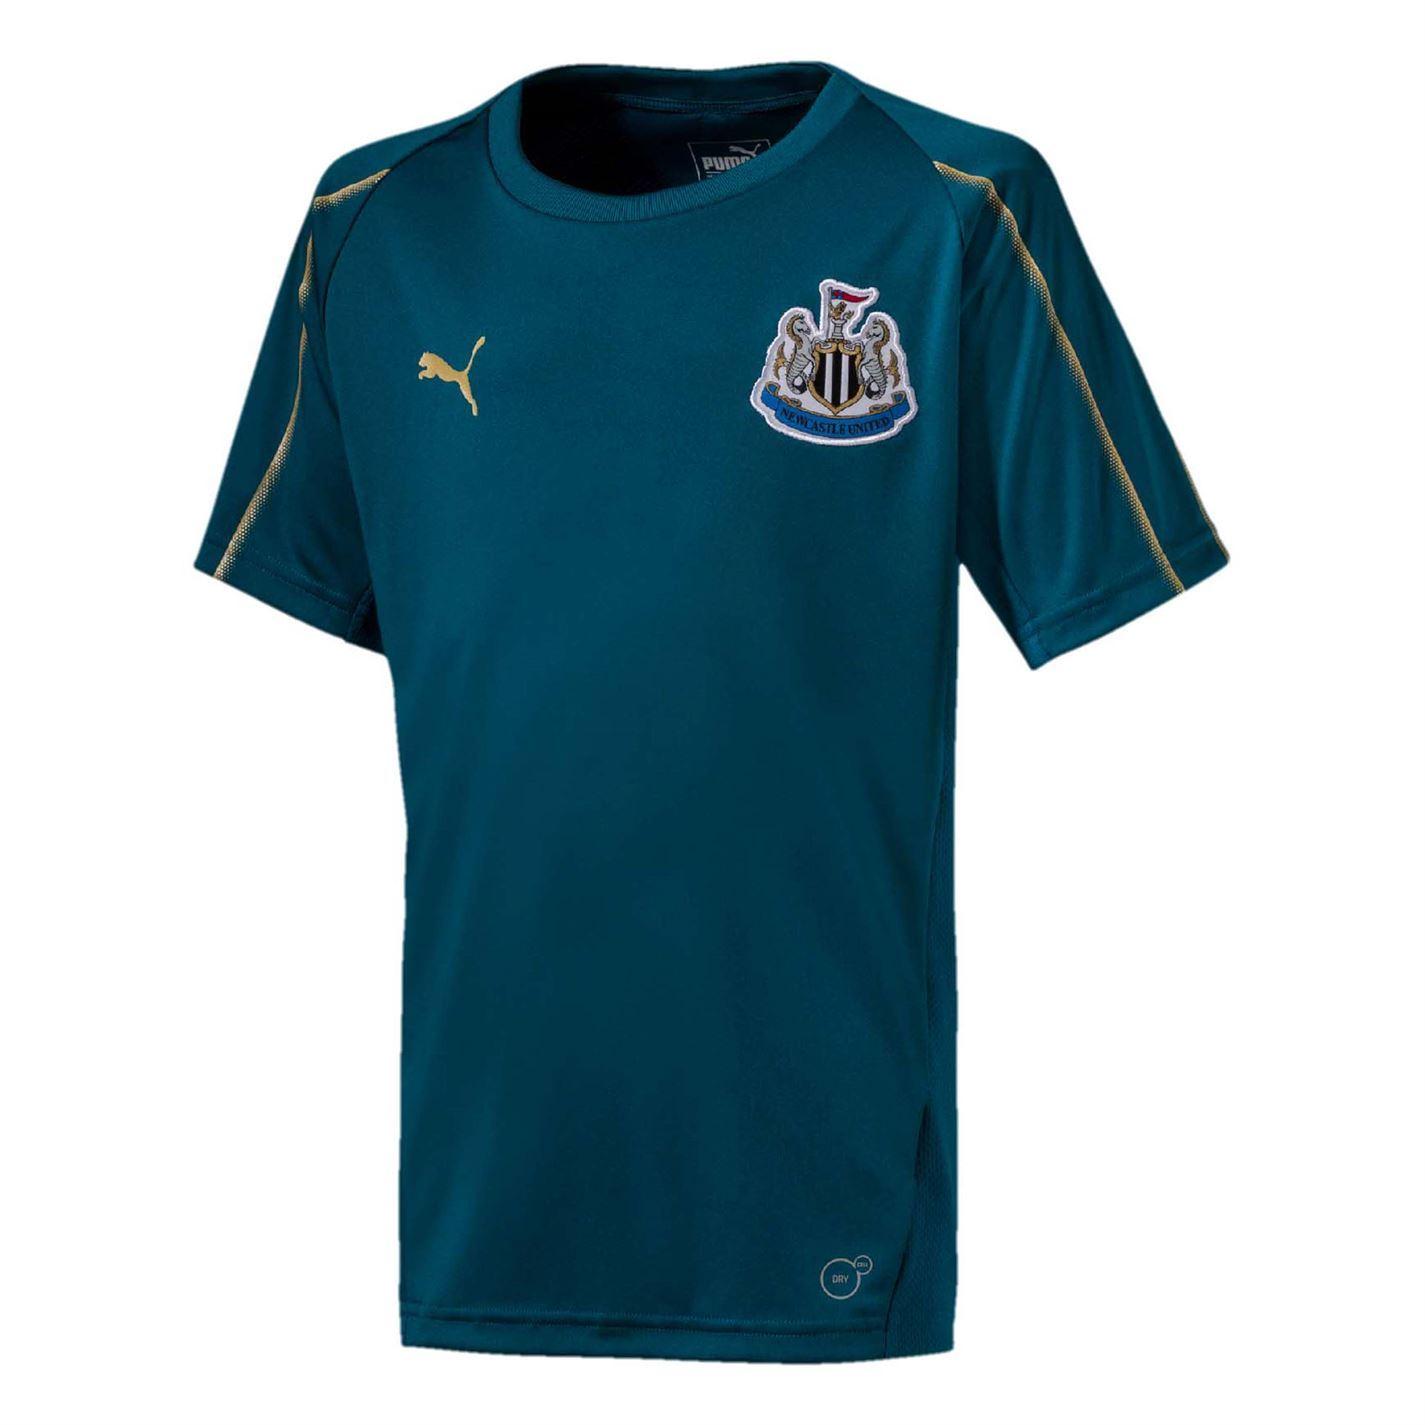 Puma Newcastle United Training Jersey 2018 2019 Football Soccer Fan ... a502b816f